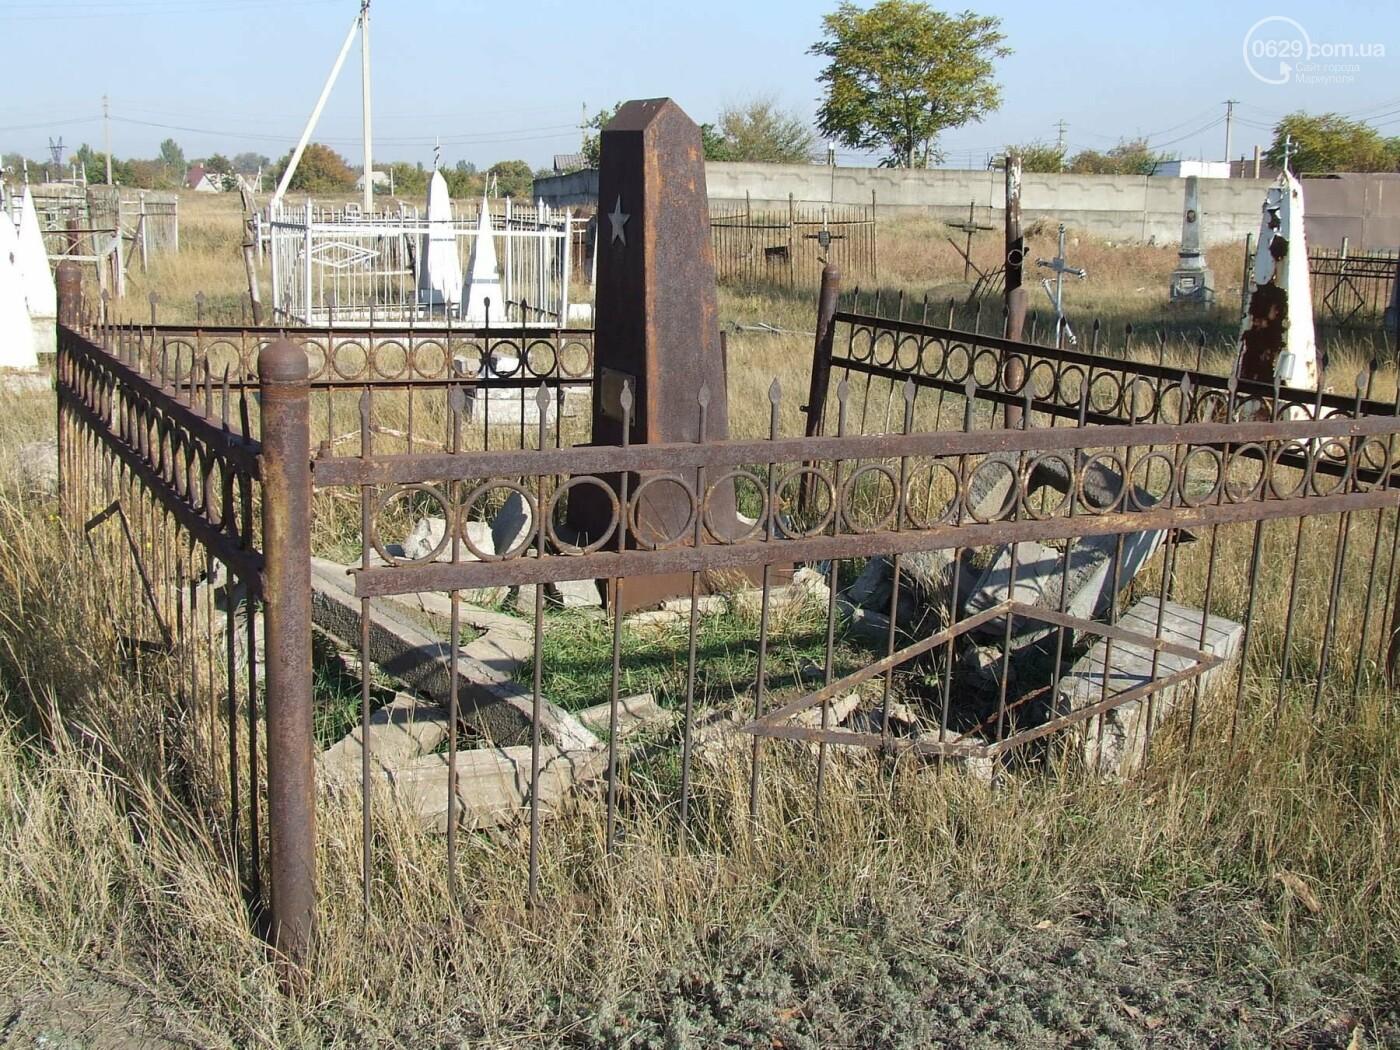 Вандалы разгромили могилы на самом старом кладбище Мариуполя, - ФОТО, фото-5